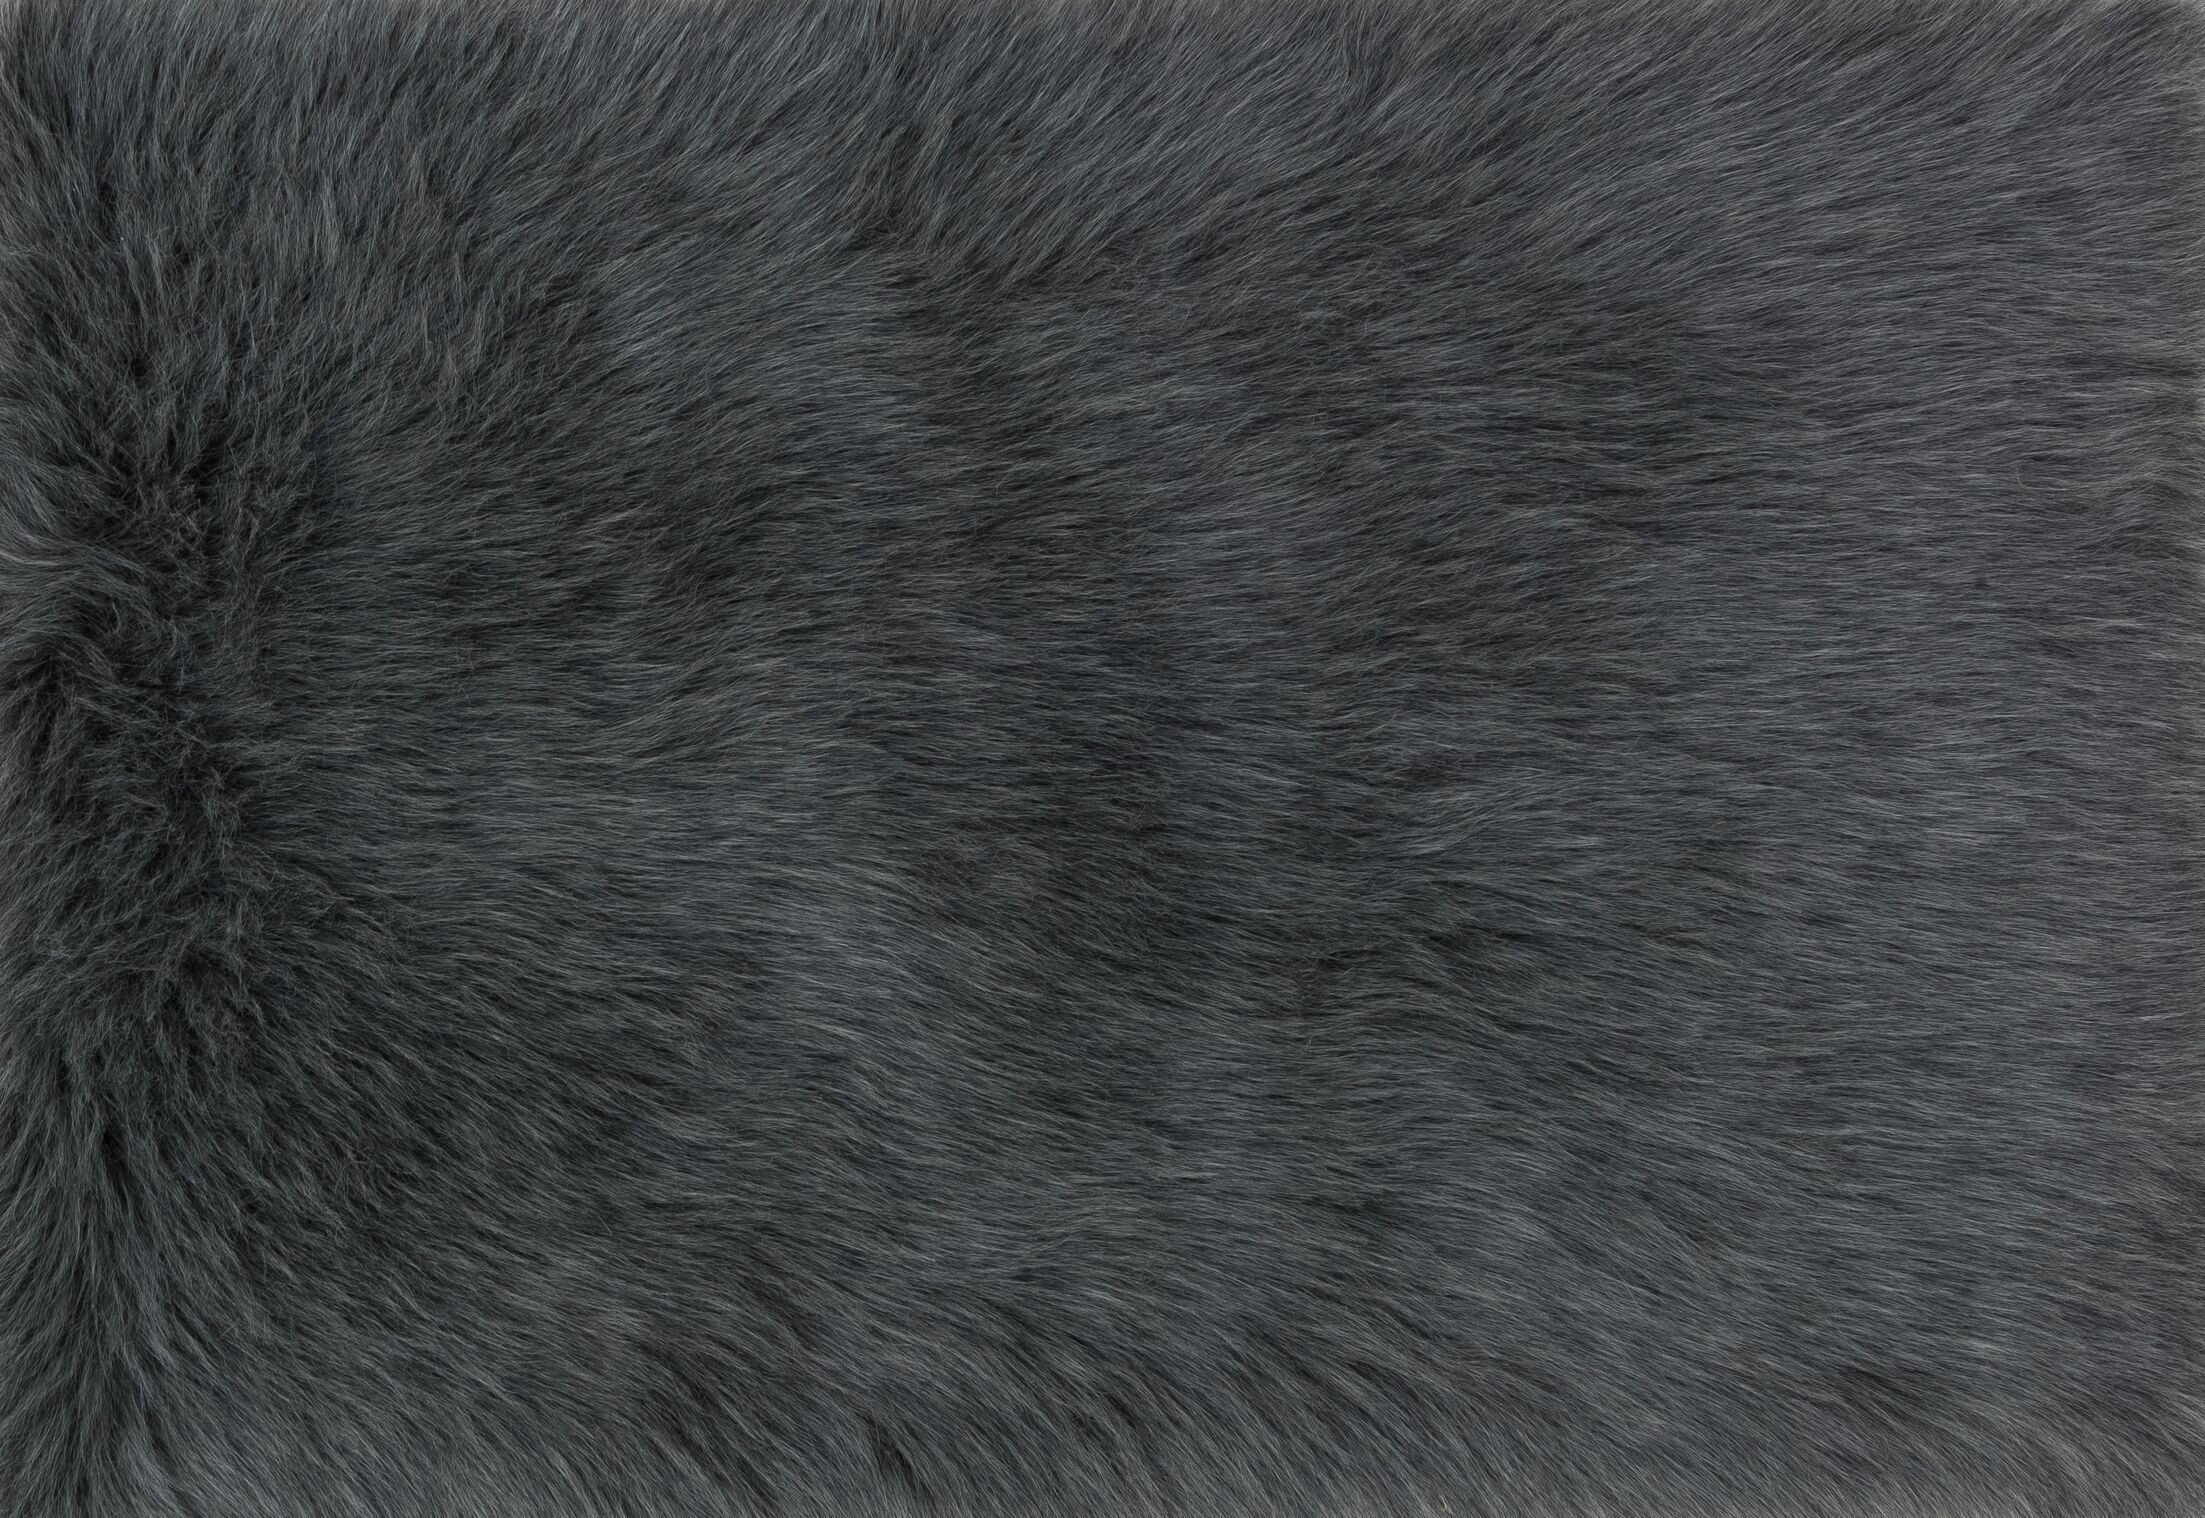 Zamorano Faux Fur Graphite Area Rug Rug Size: Rectangle 3' x 5'